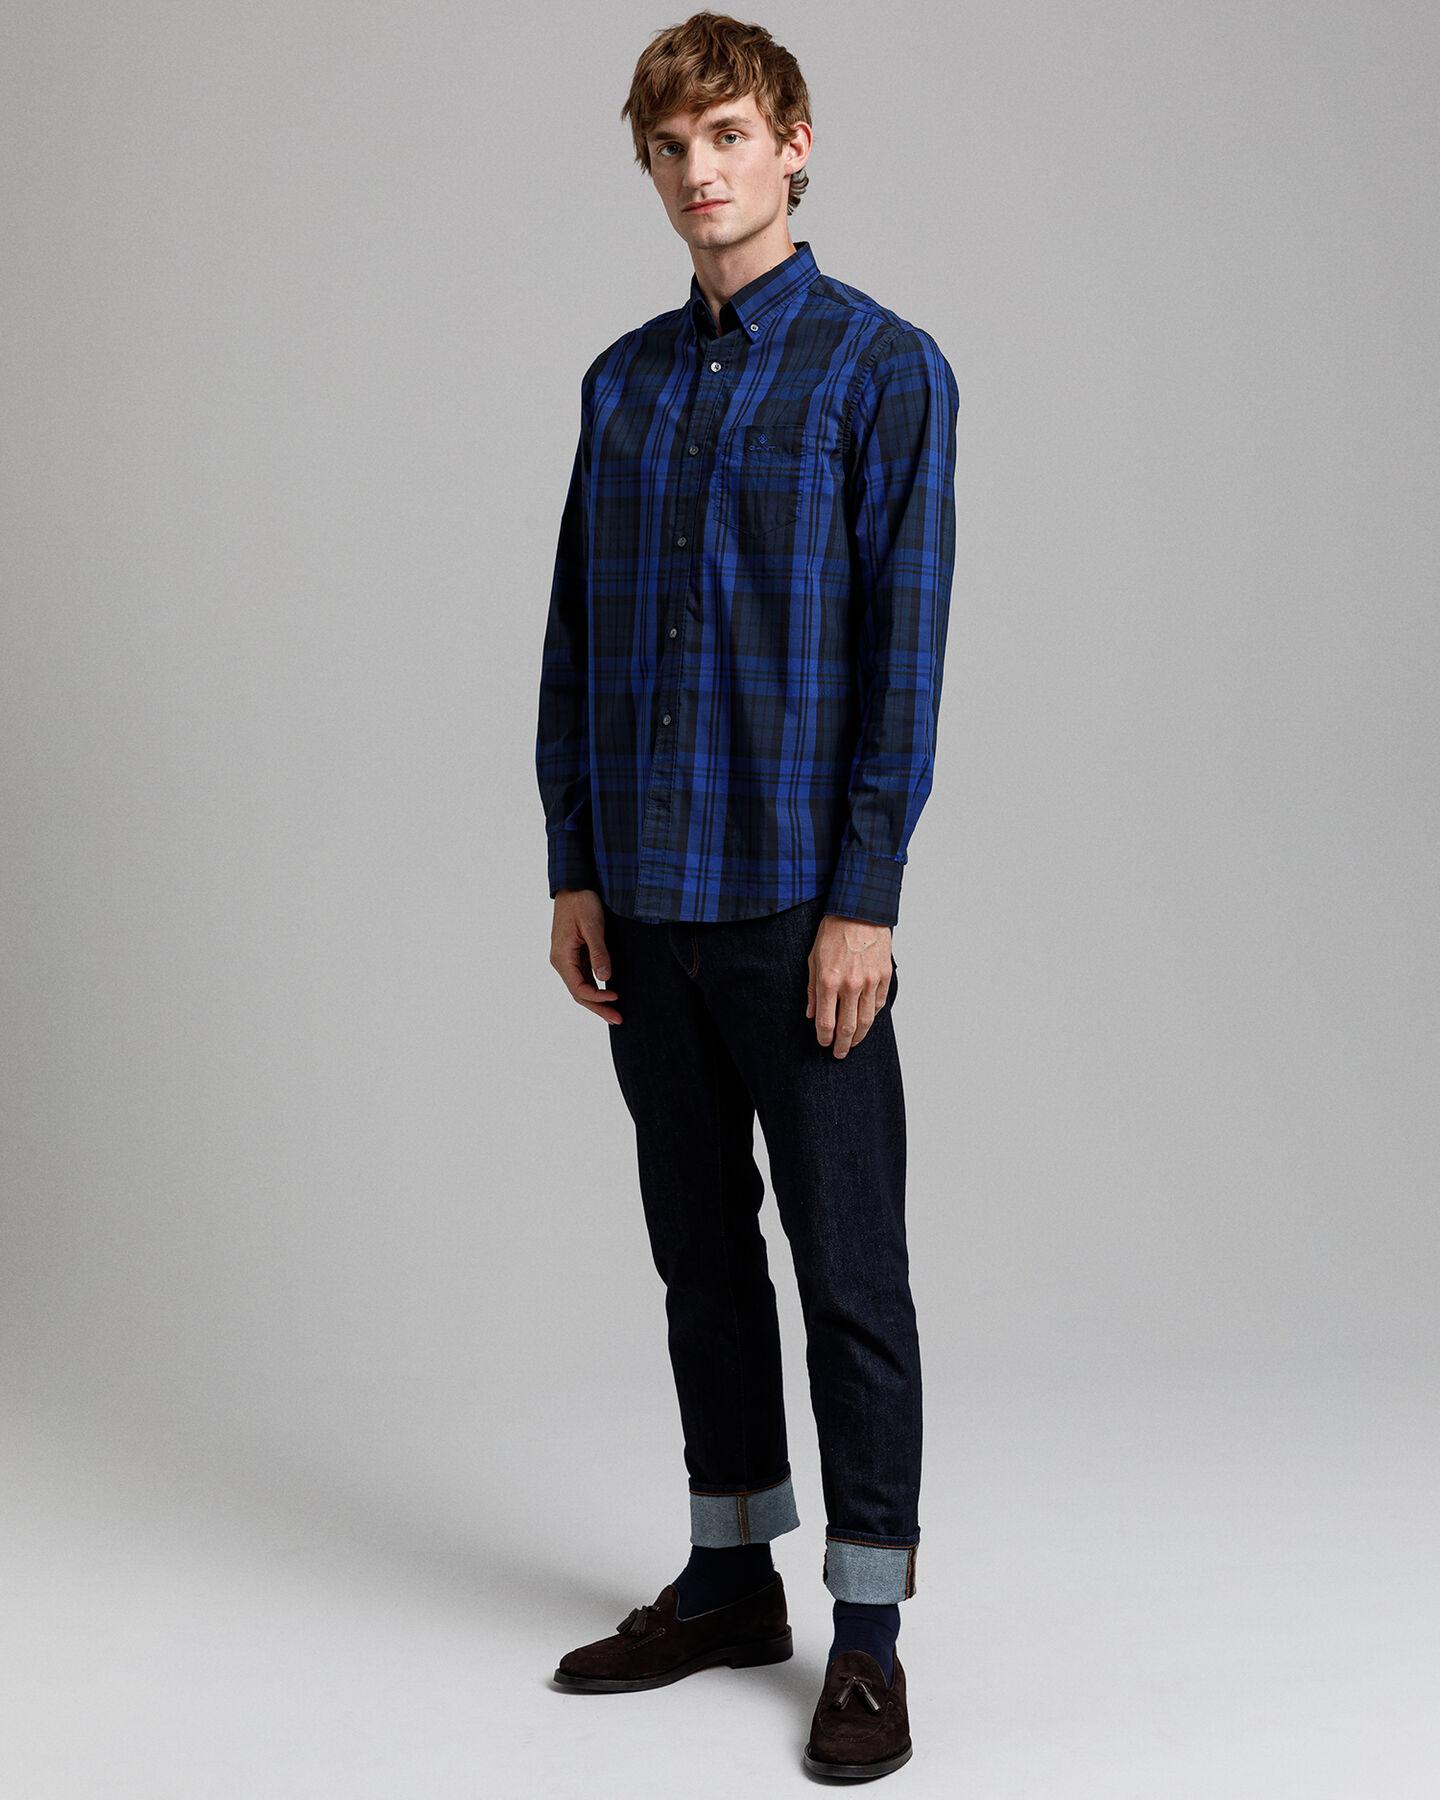 Tech Prep™ Regular Fit Broadcloth Hemd im Winterkaro